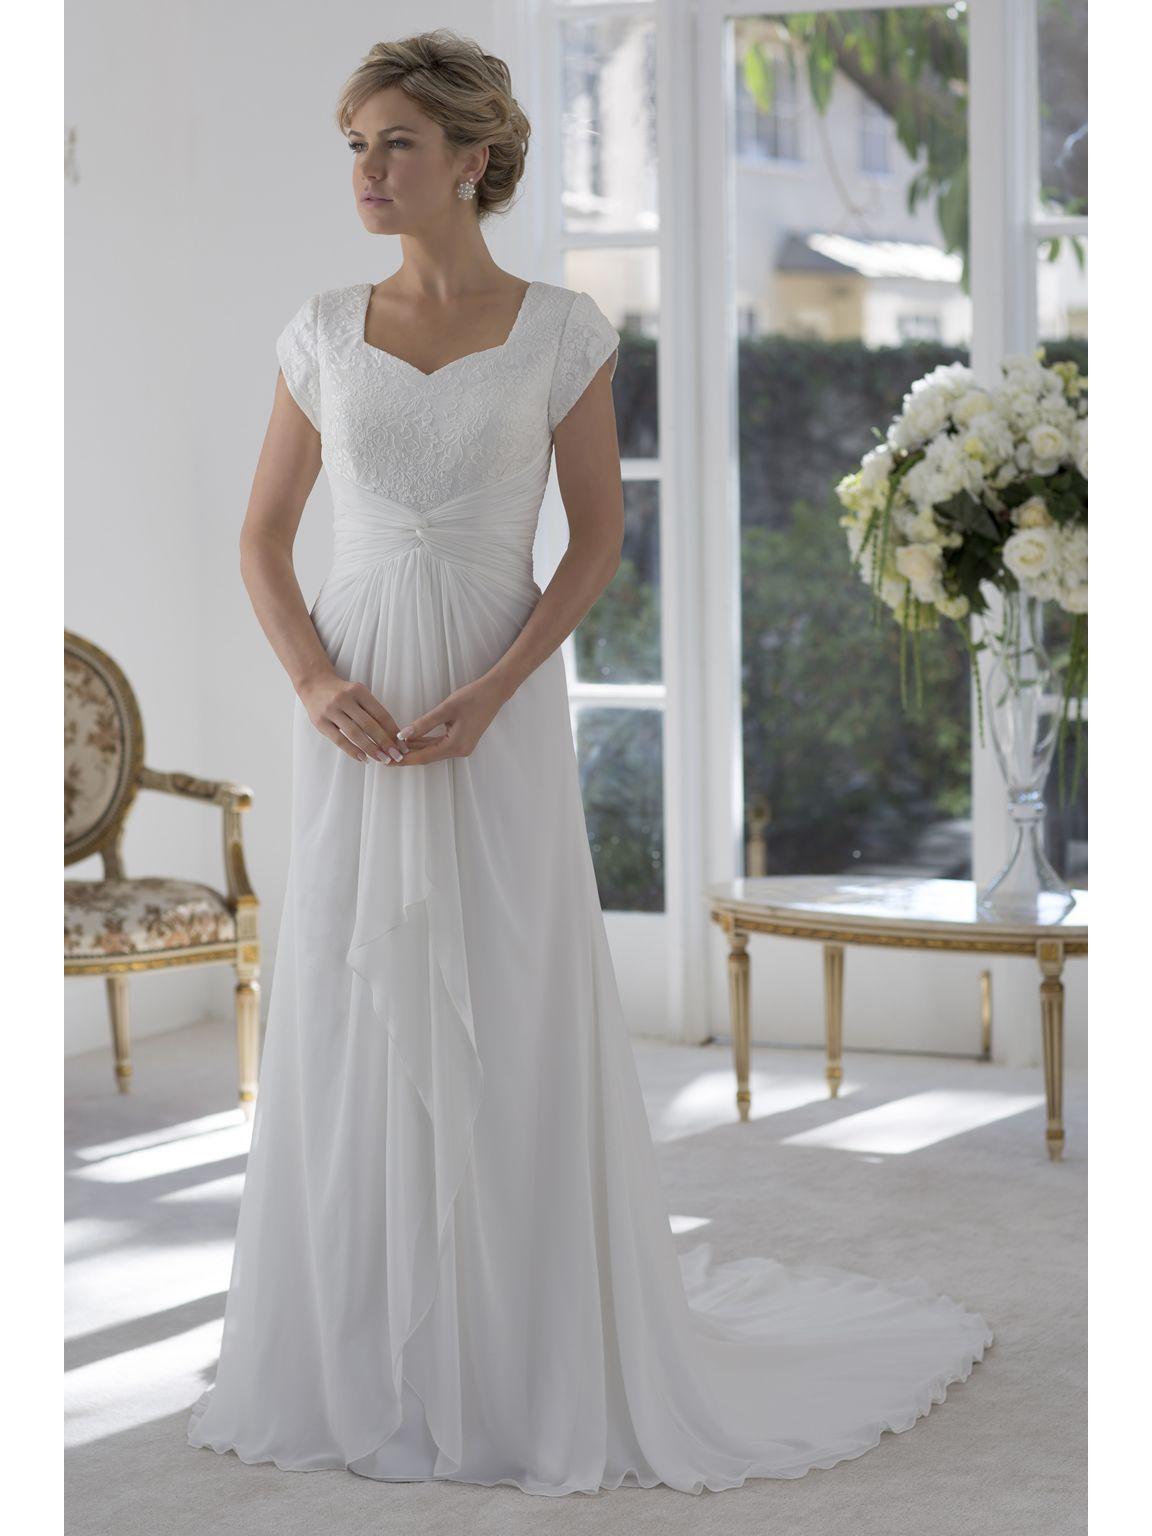 Discount informal lace chiffon beach modest wedding for Informal wedding dresses cheap